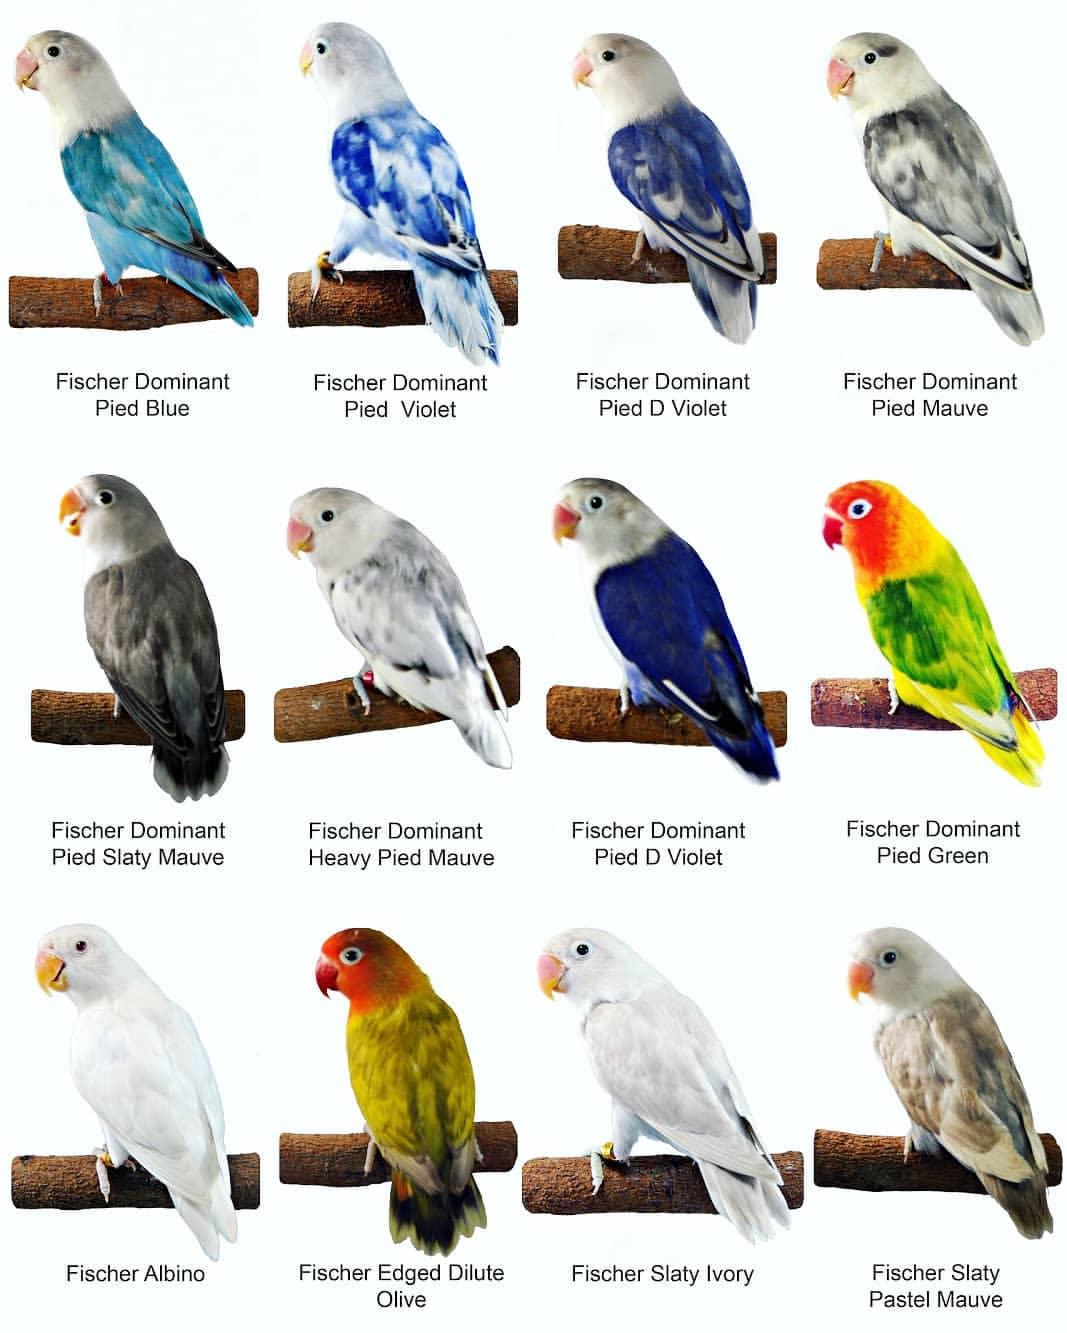 88 Foto Gambar Burung Lovebird Warna Hitam HD Terbaru